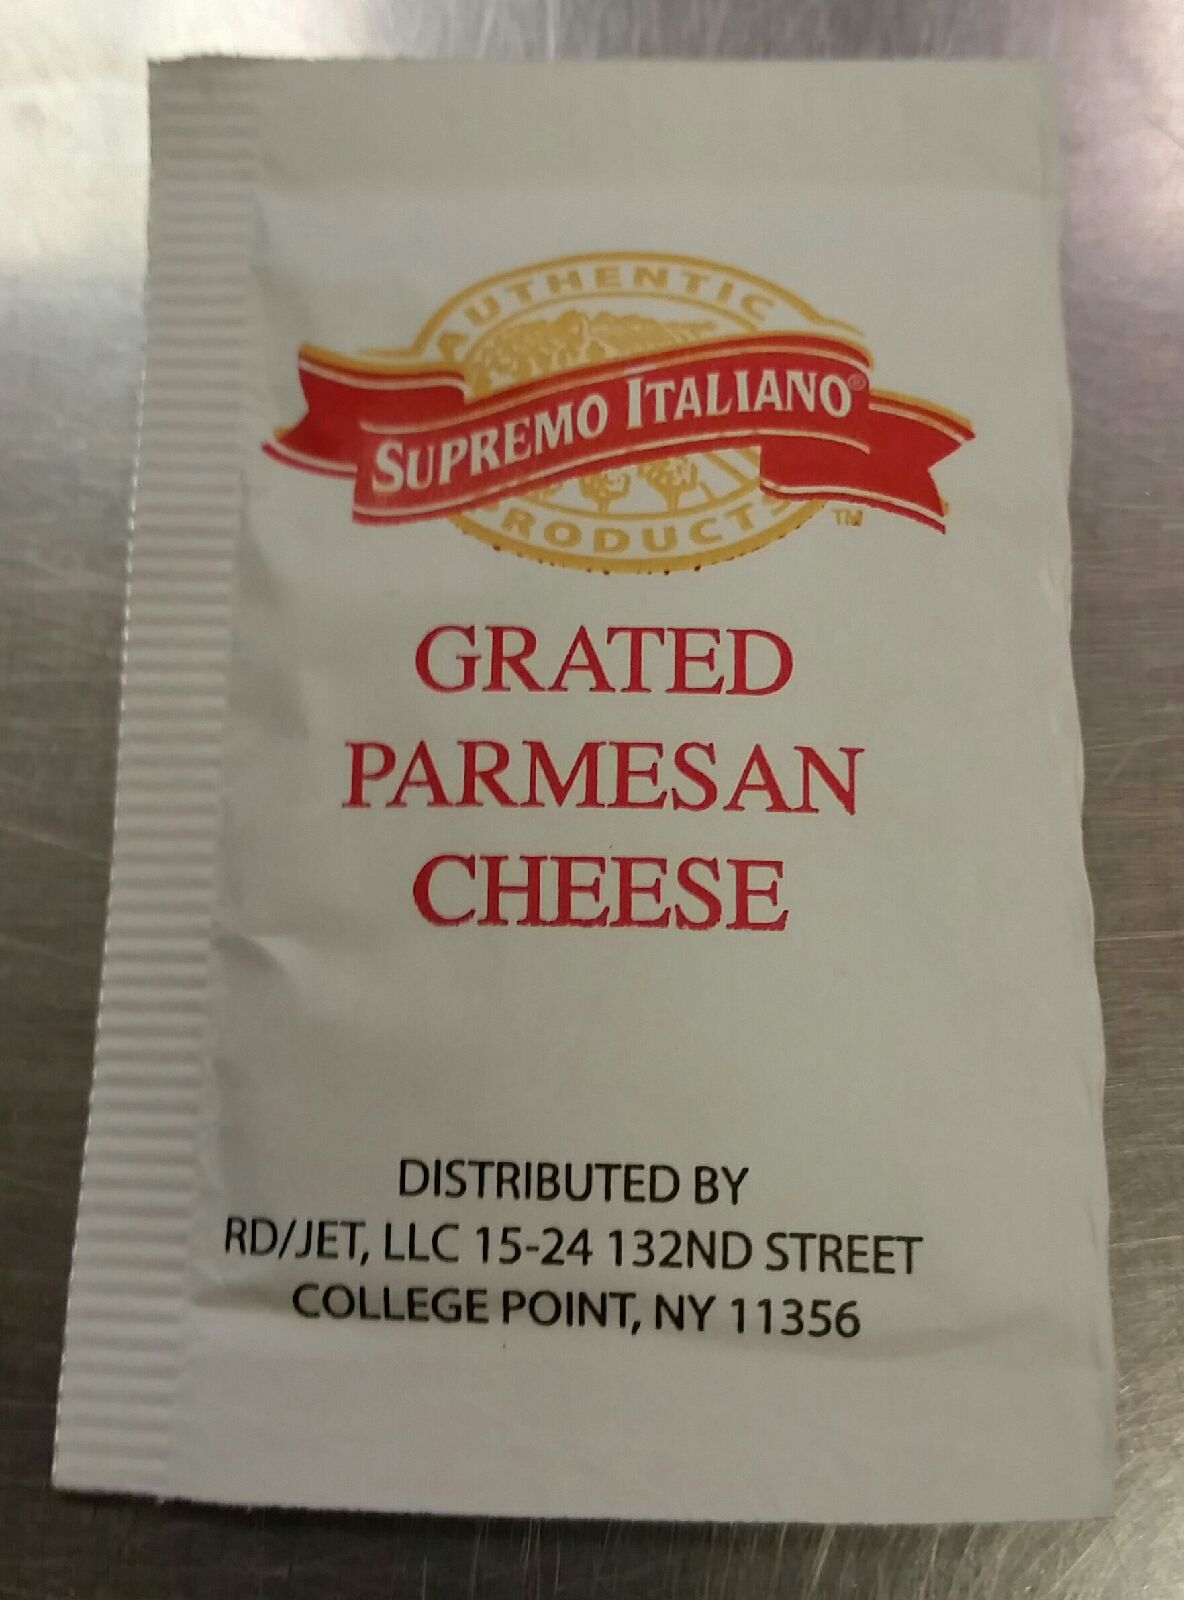 Parmesan Packet Image